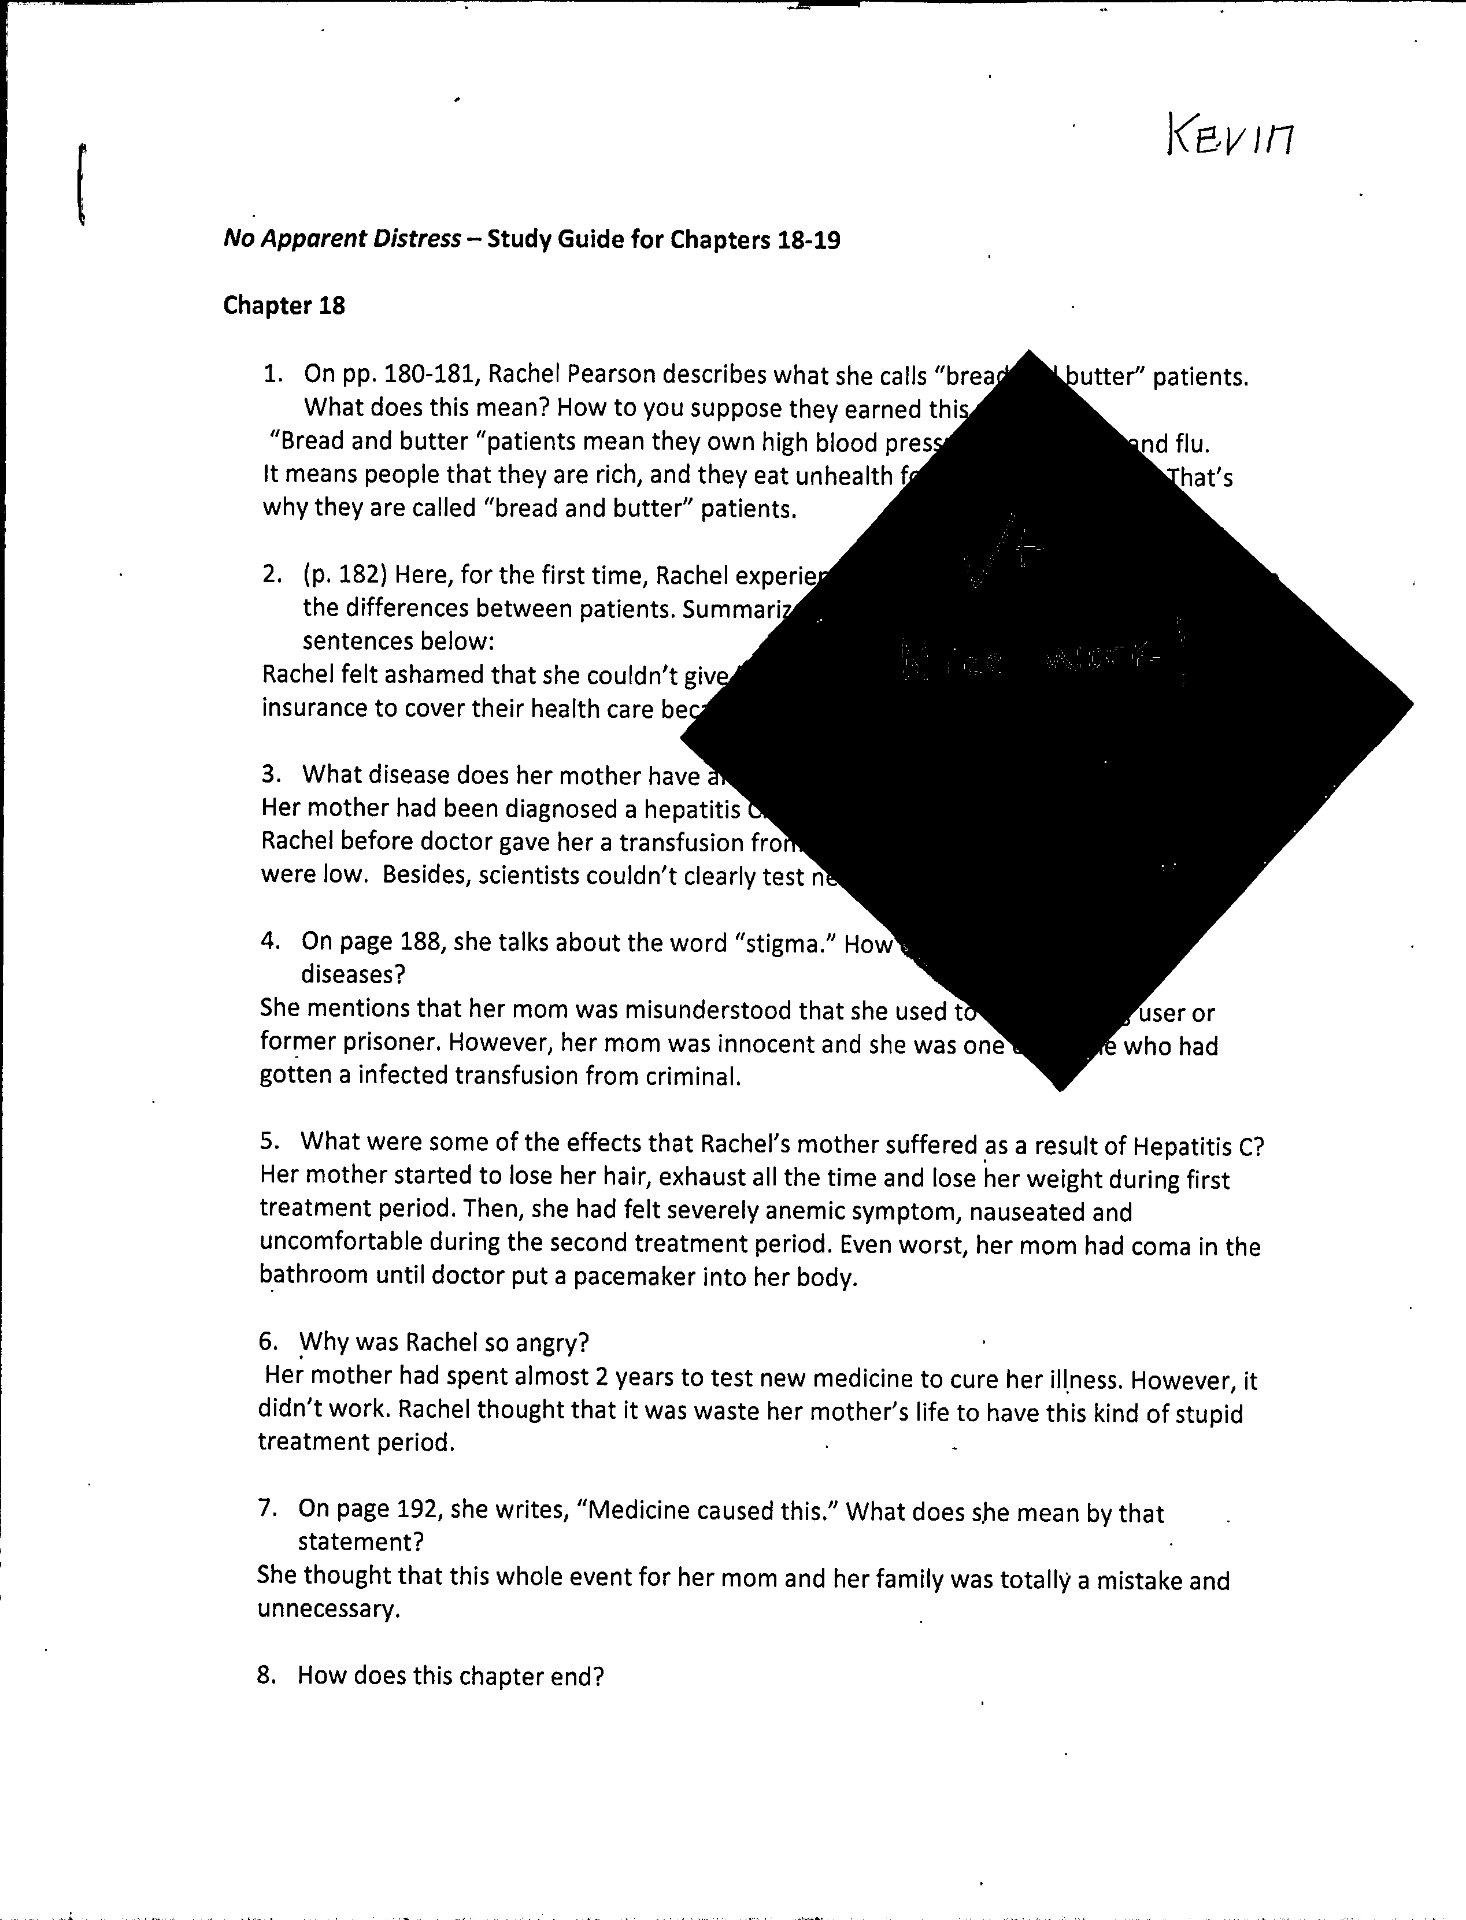 Study Guide | Kuo Kuang's Portfolio